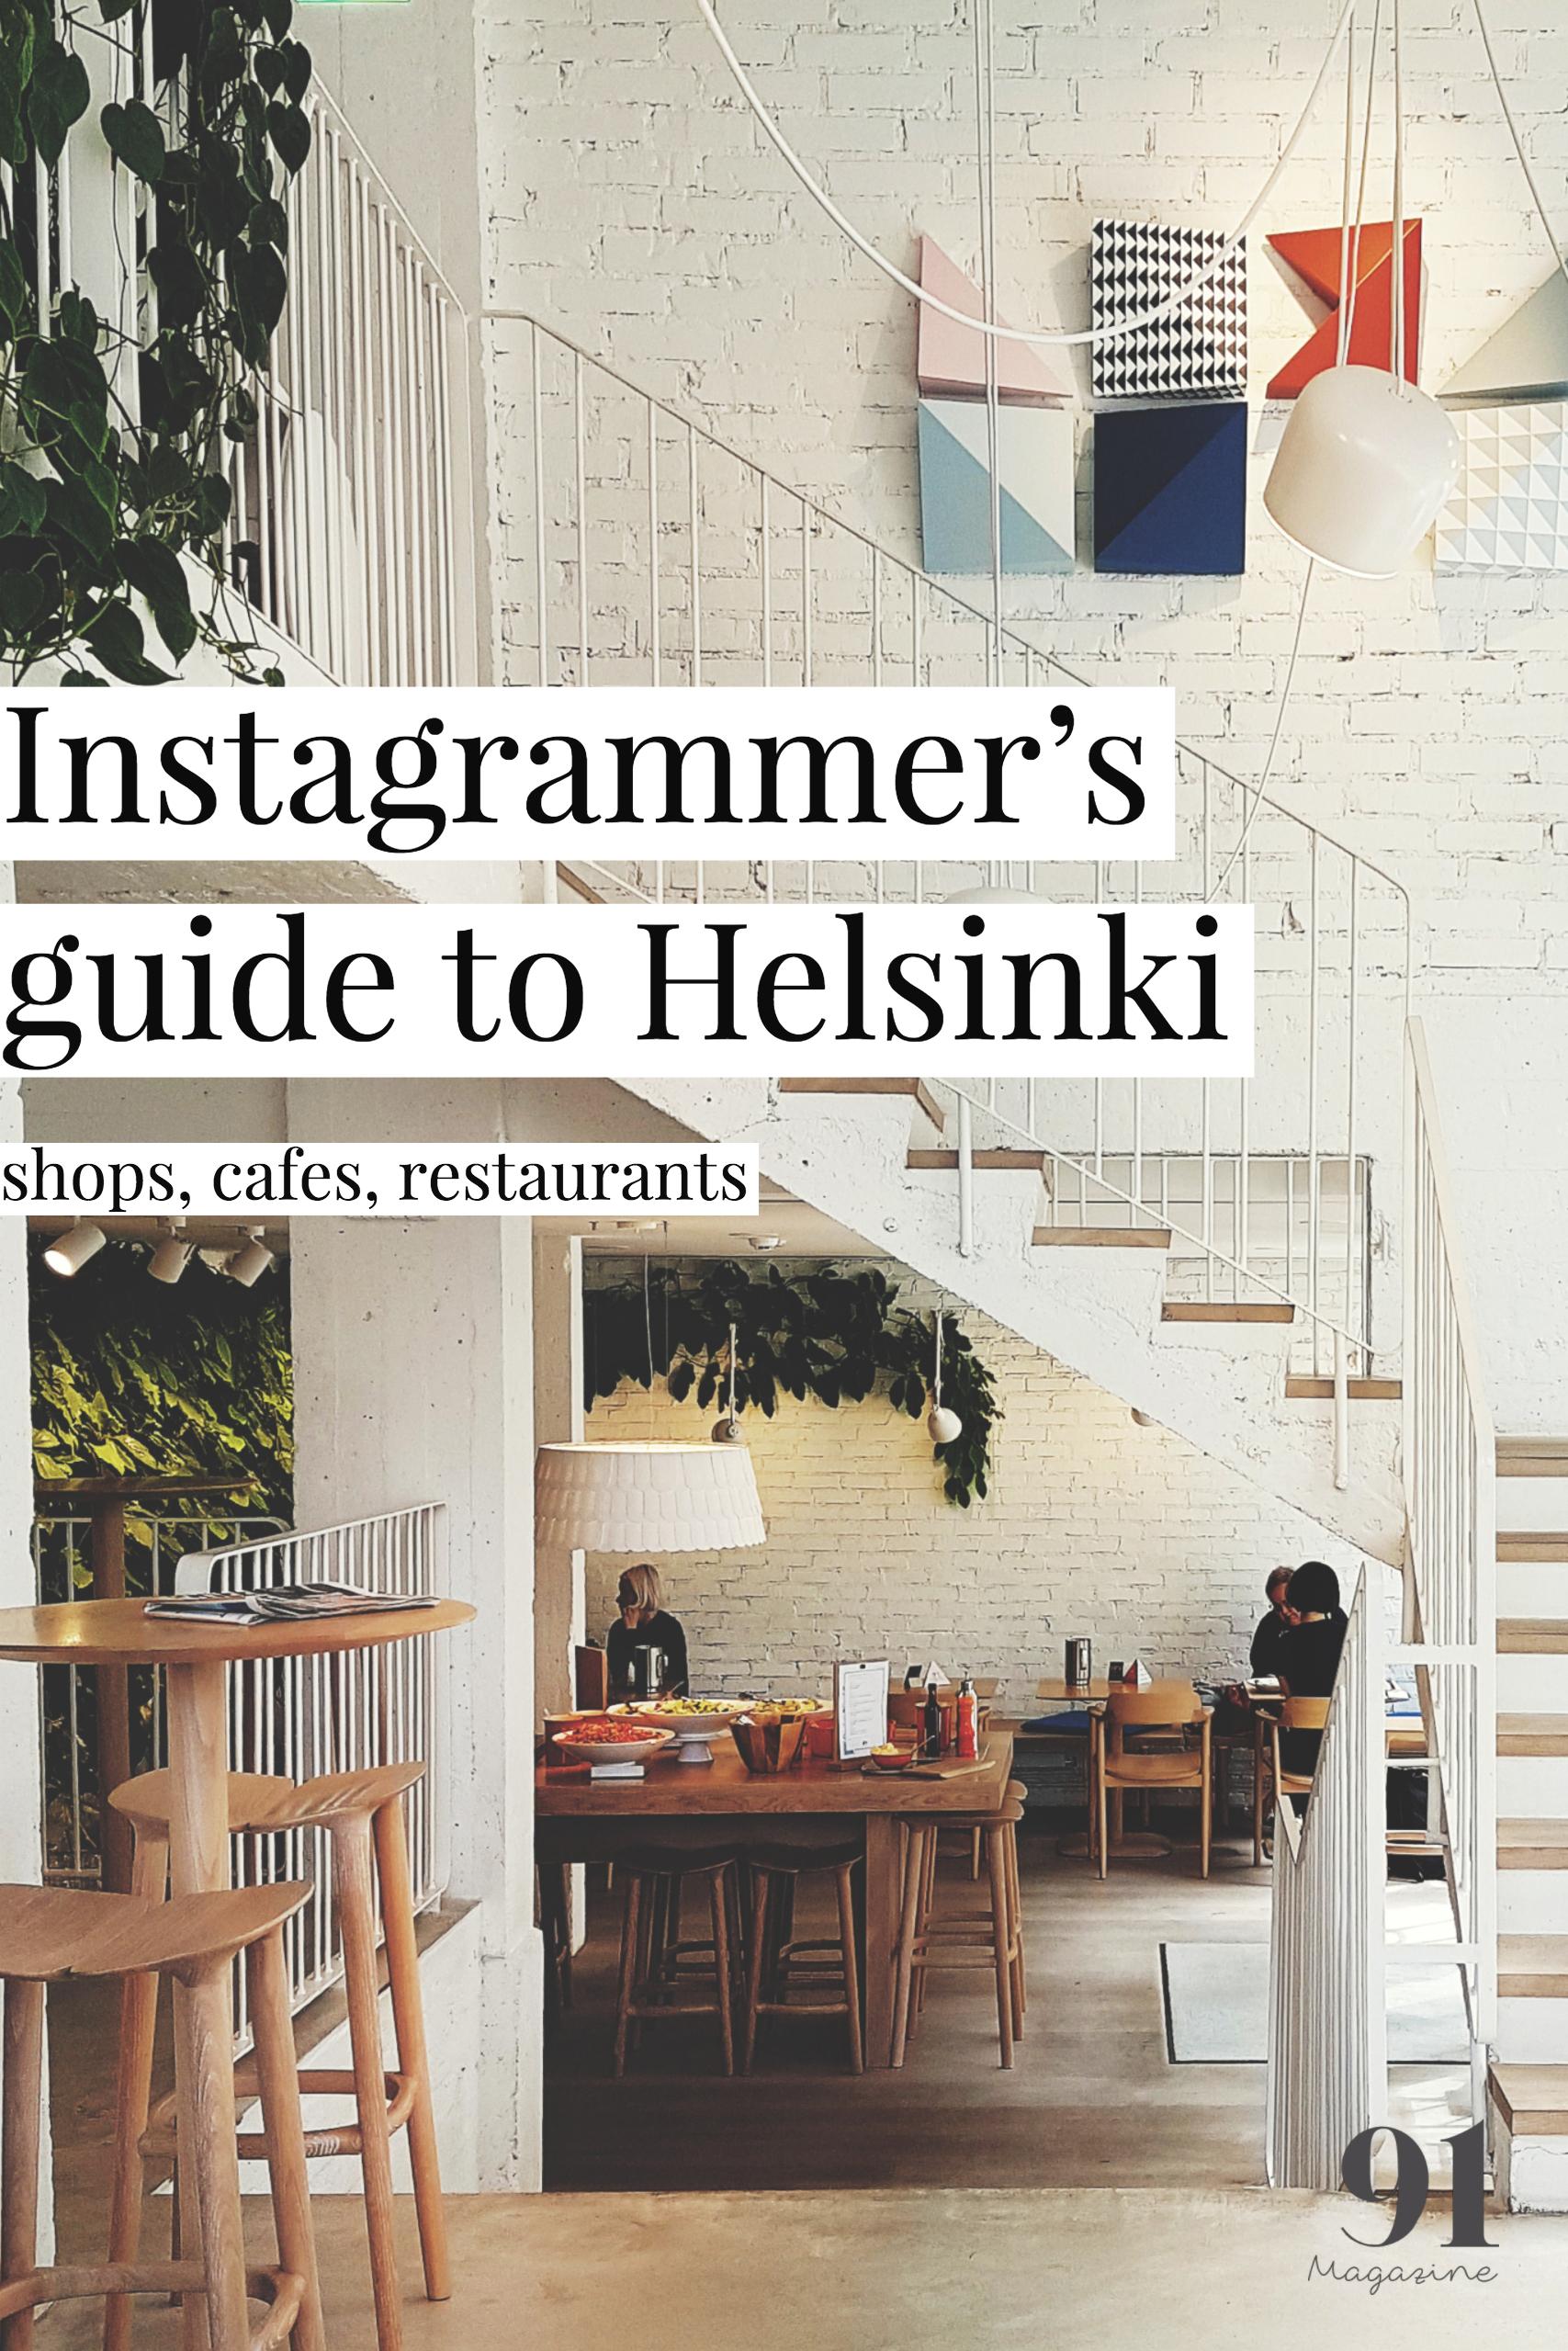 Instagrammer's guide to Helsinki